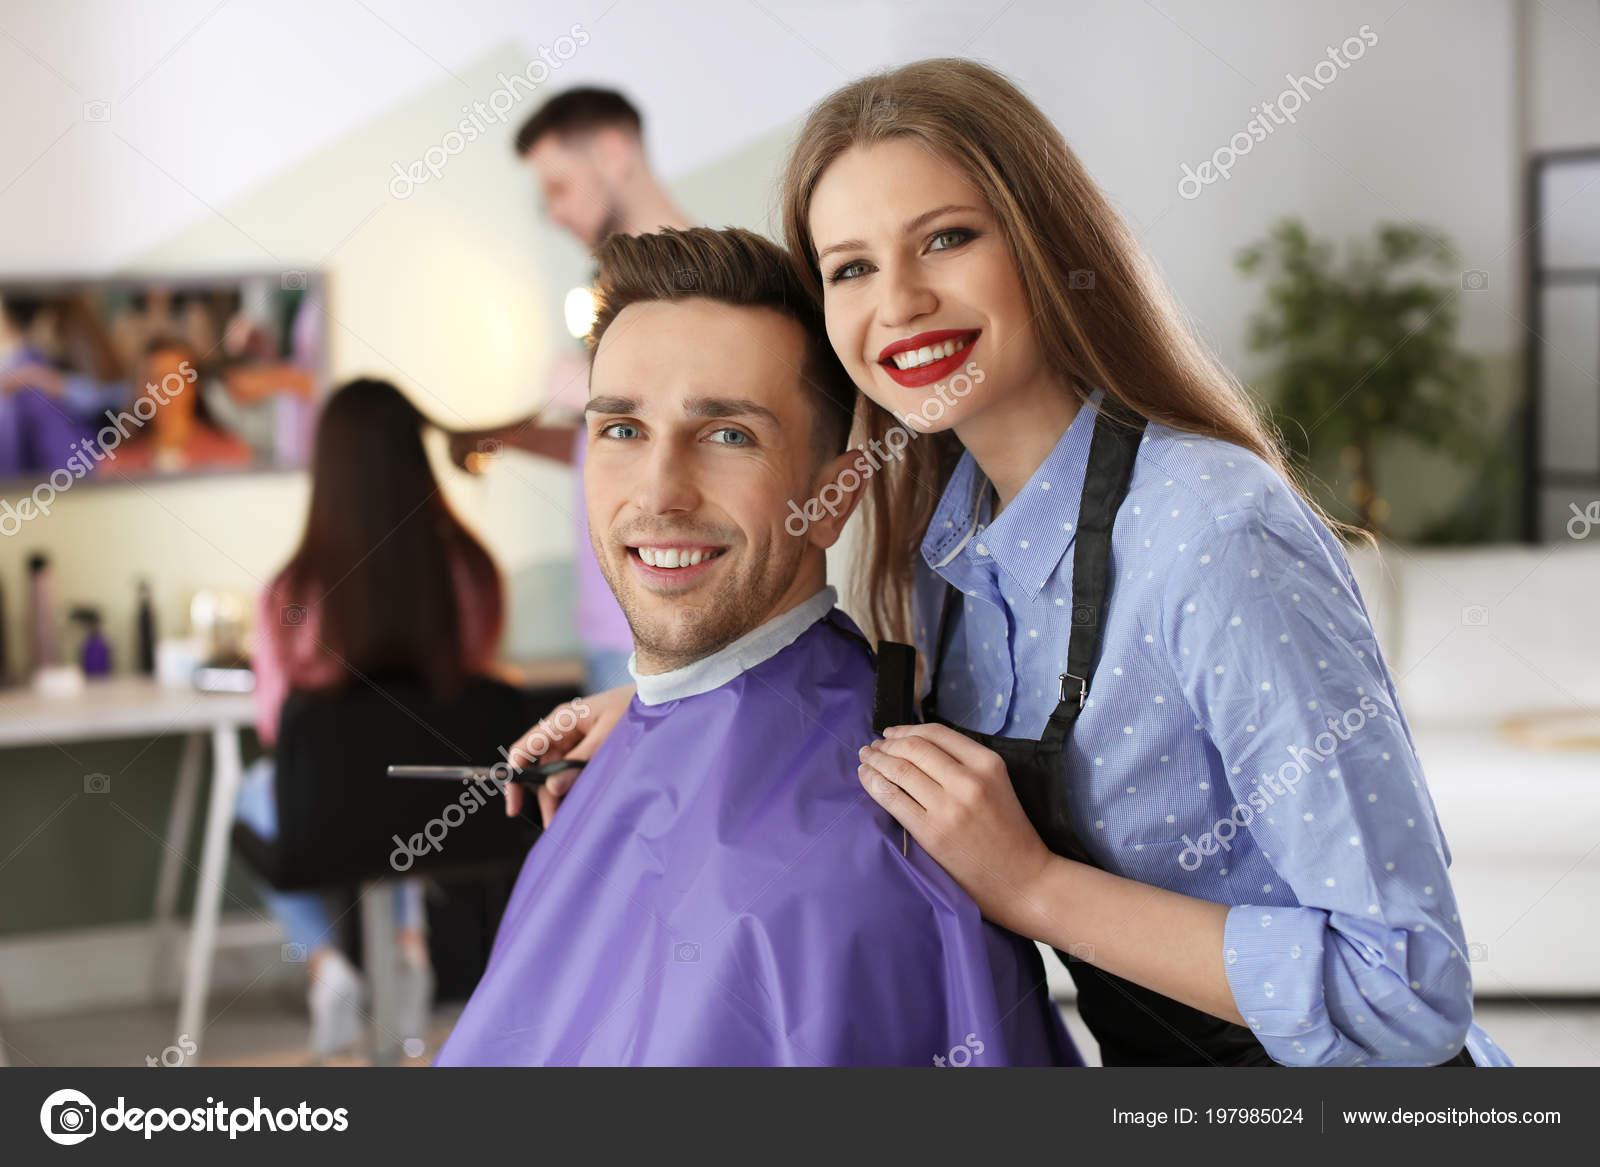 Salon dating